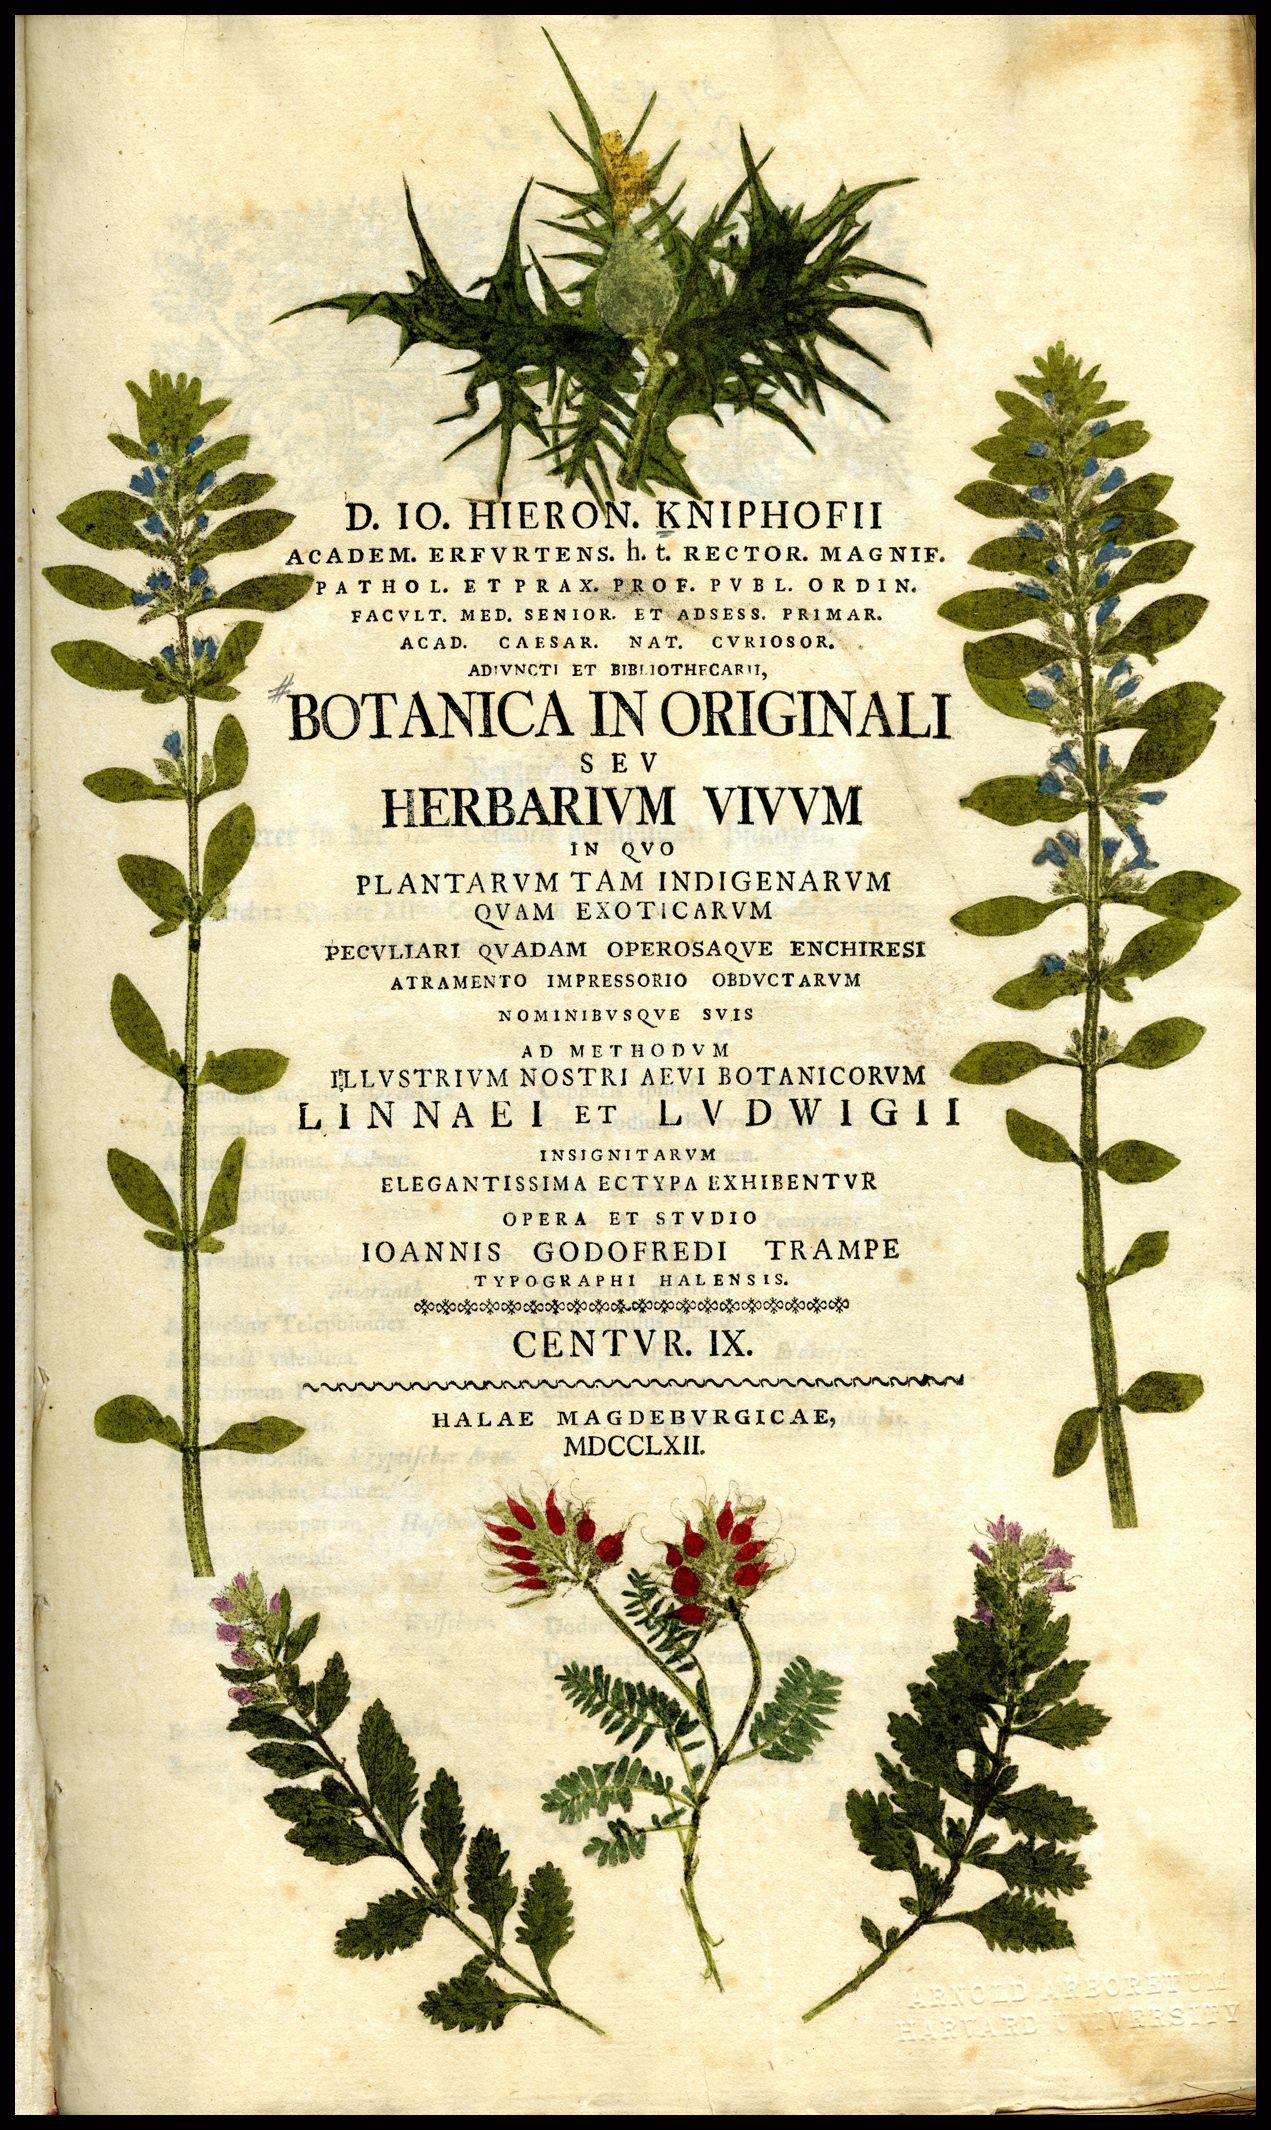 Gray's Botanical text